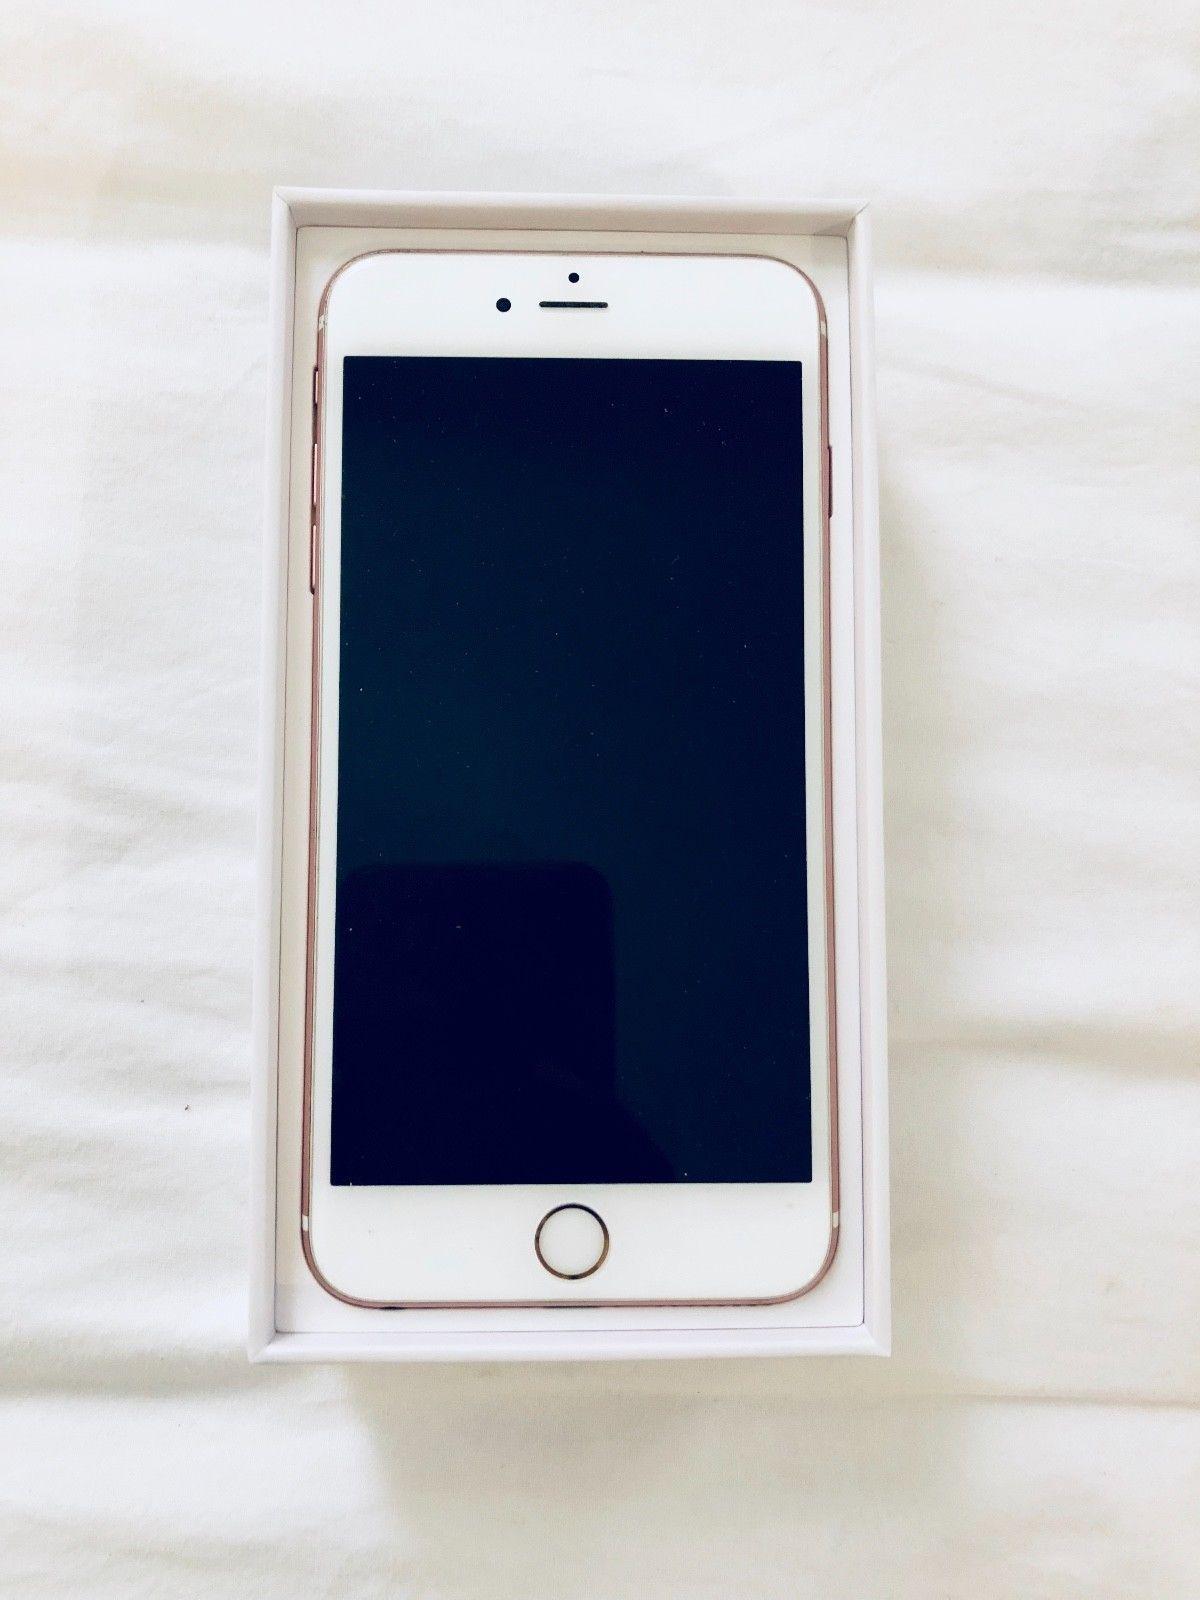 Apple Iphone 6s Plus 64gb Rose Gold T Mobile A1687 Cdma